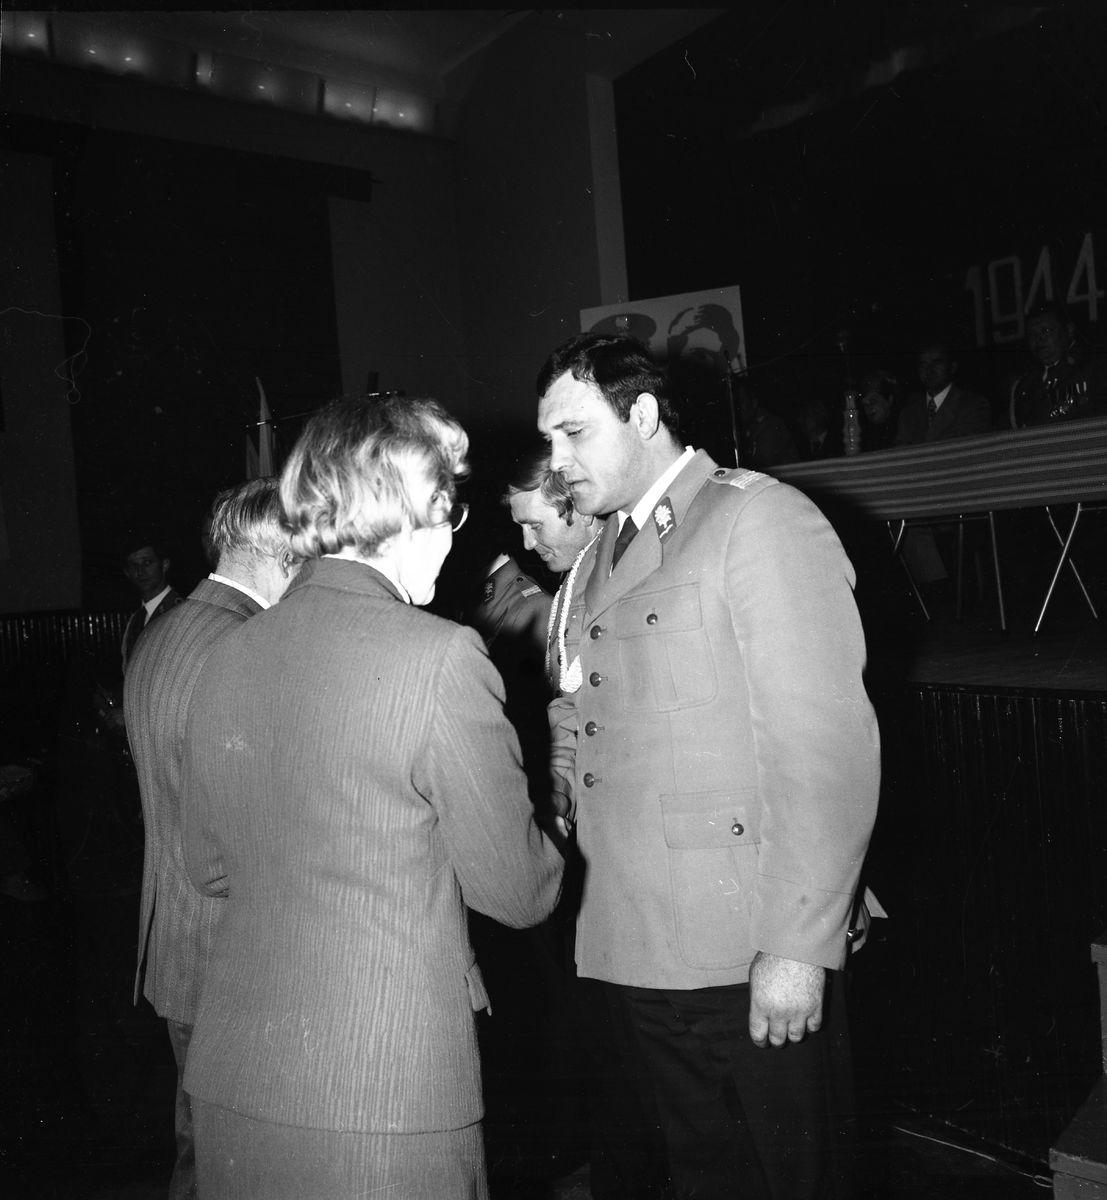 Obchody Święta MO i SB, 1979 r. [3]